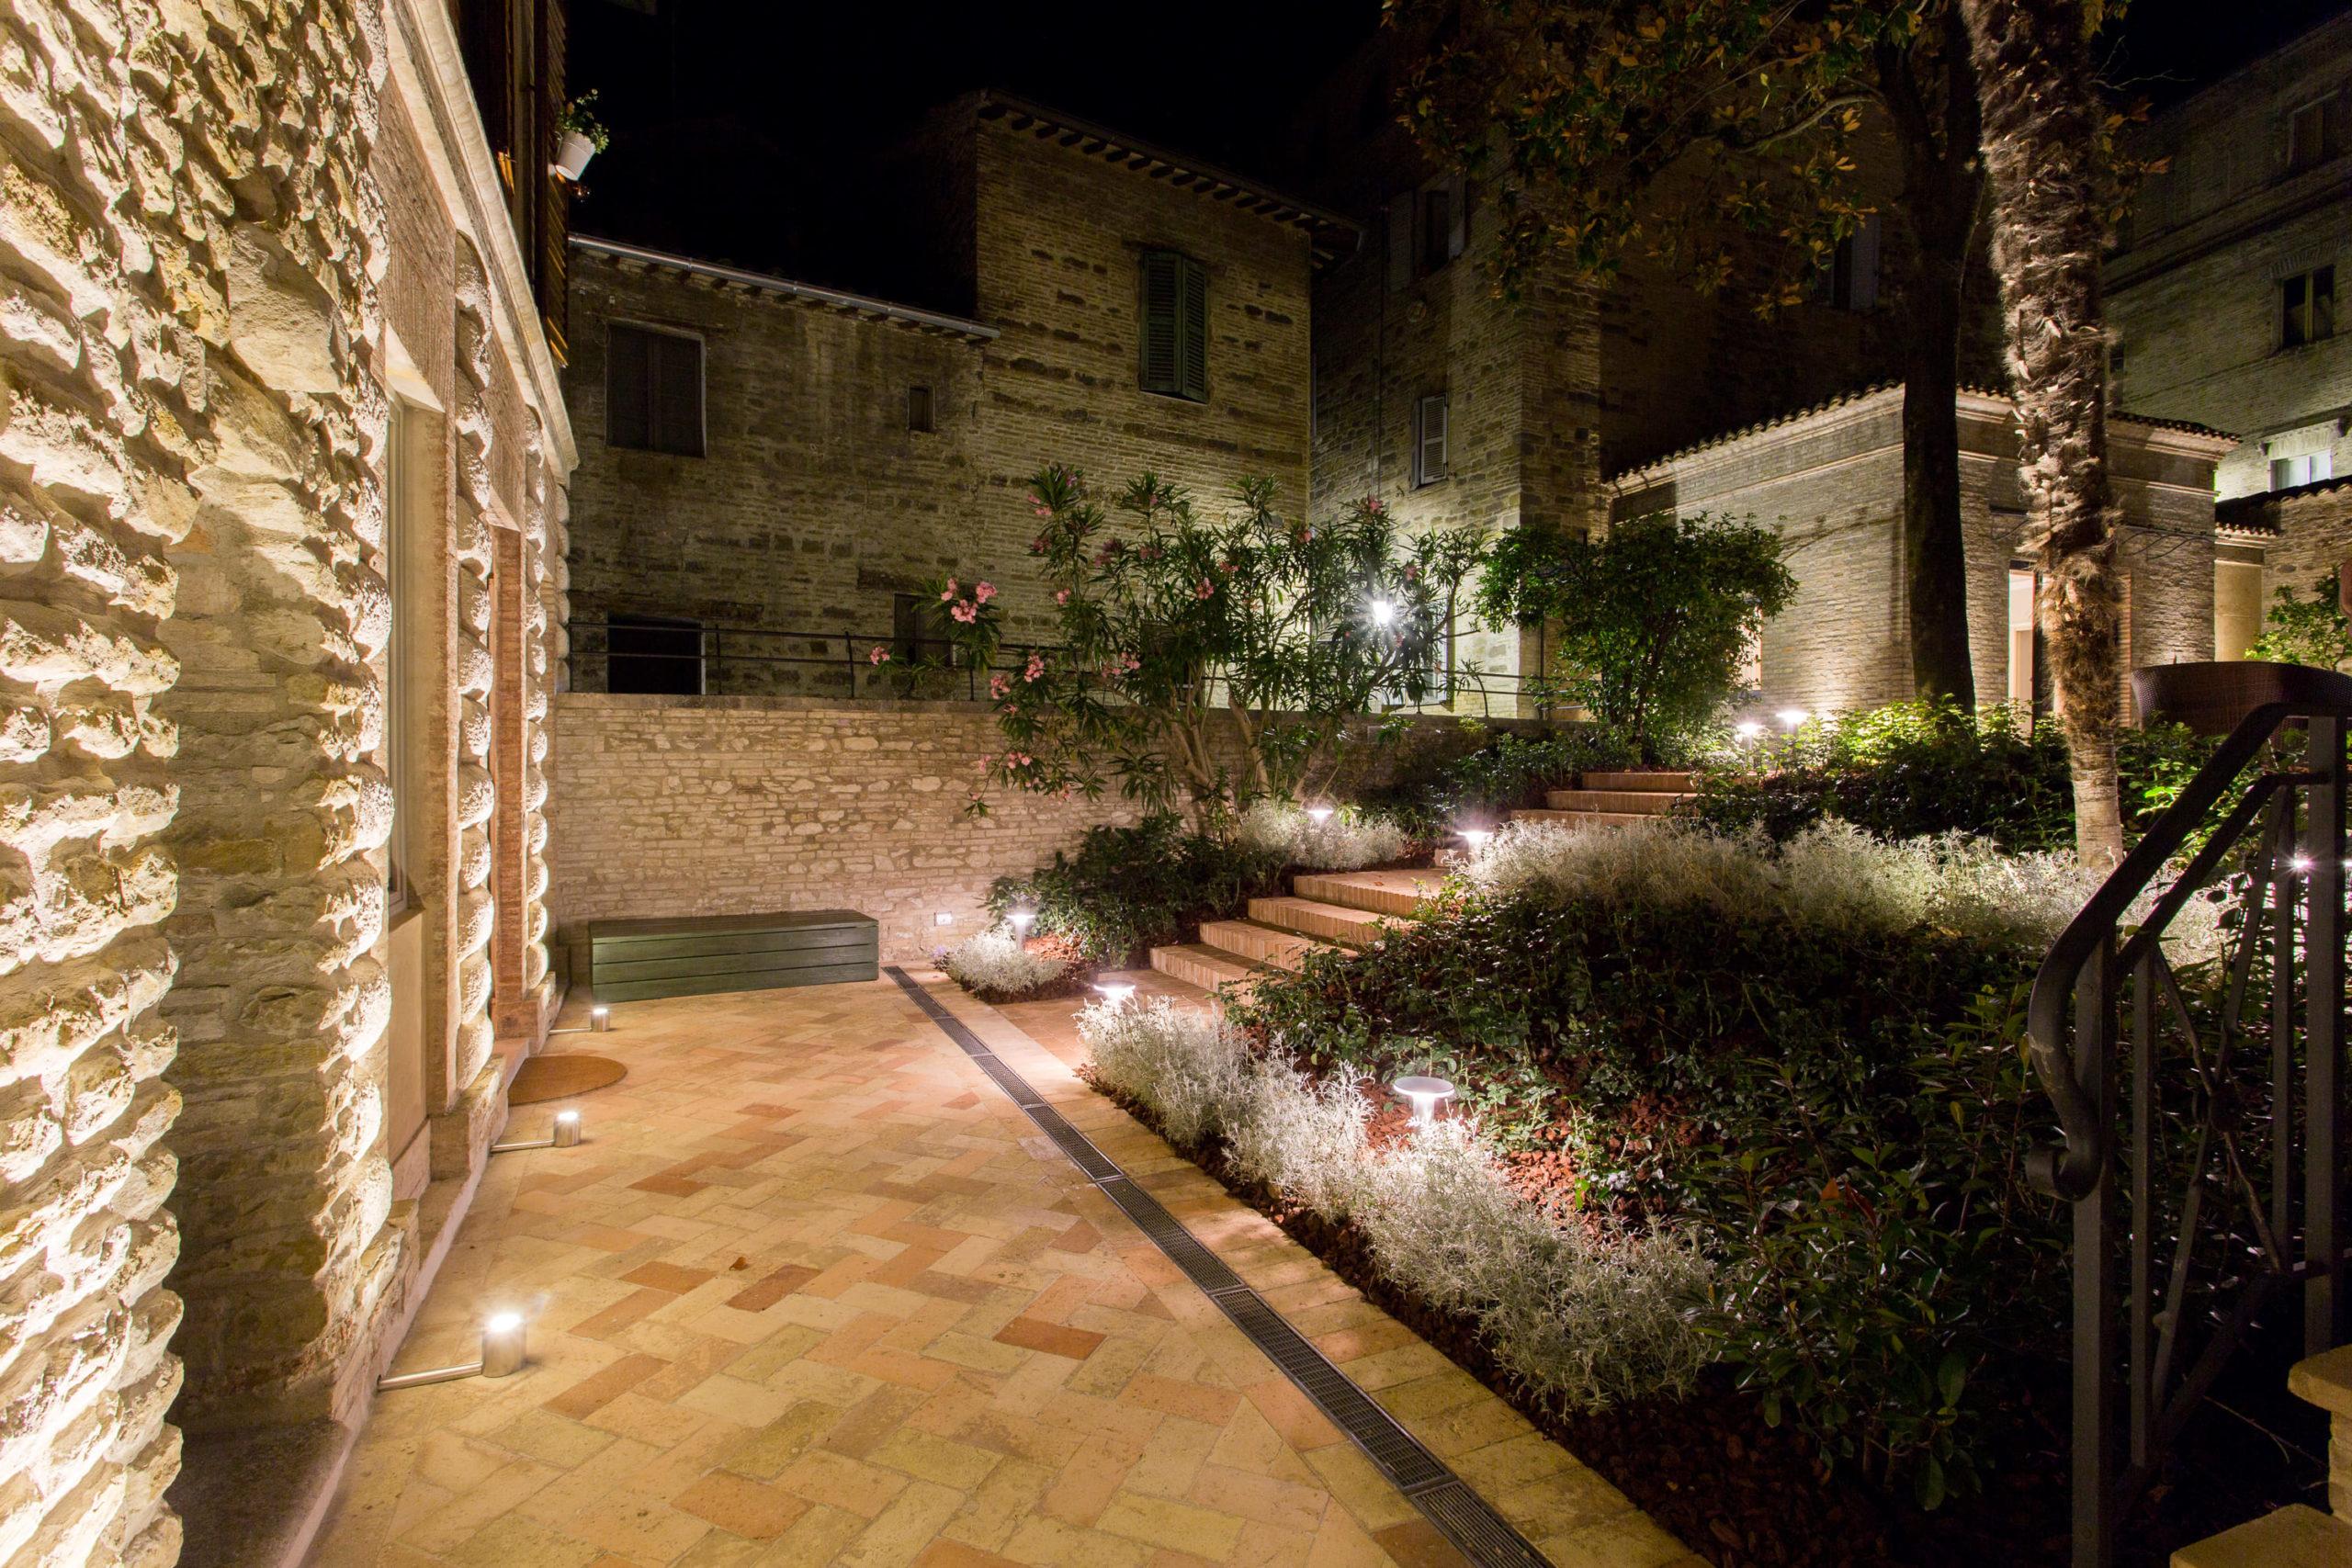 giardino due palazzo gentili